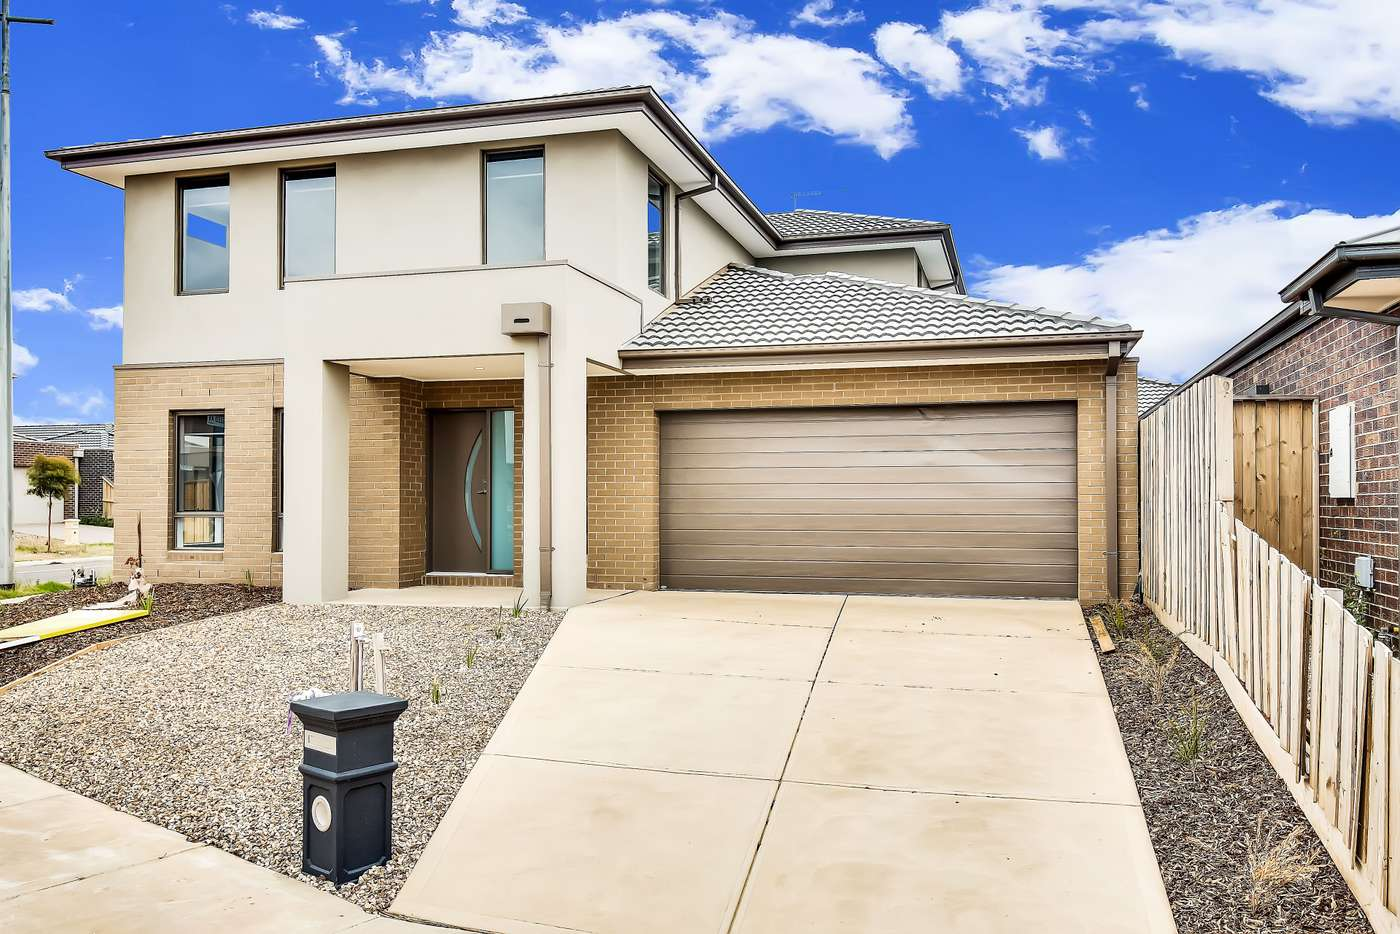 Main view of Homely house listing, 25 Haystack Drive, Truganina VIC 3029